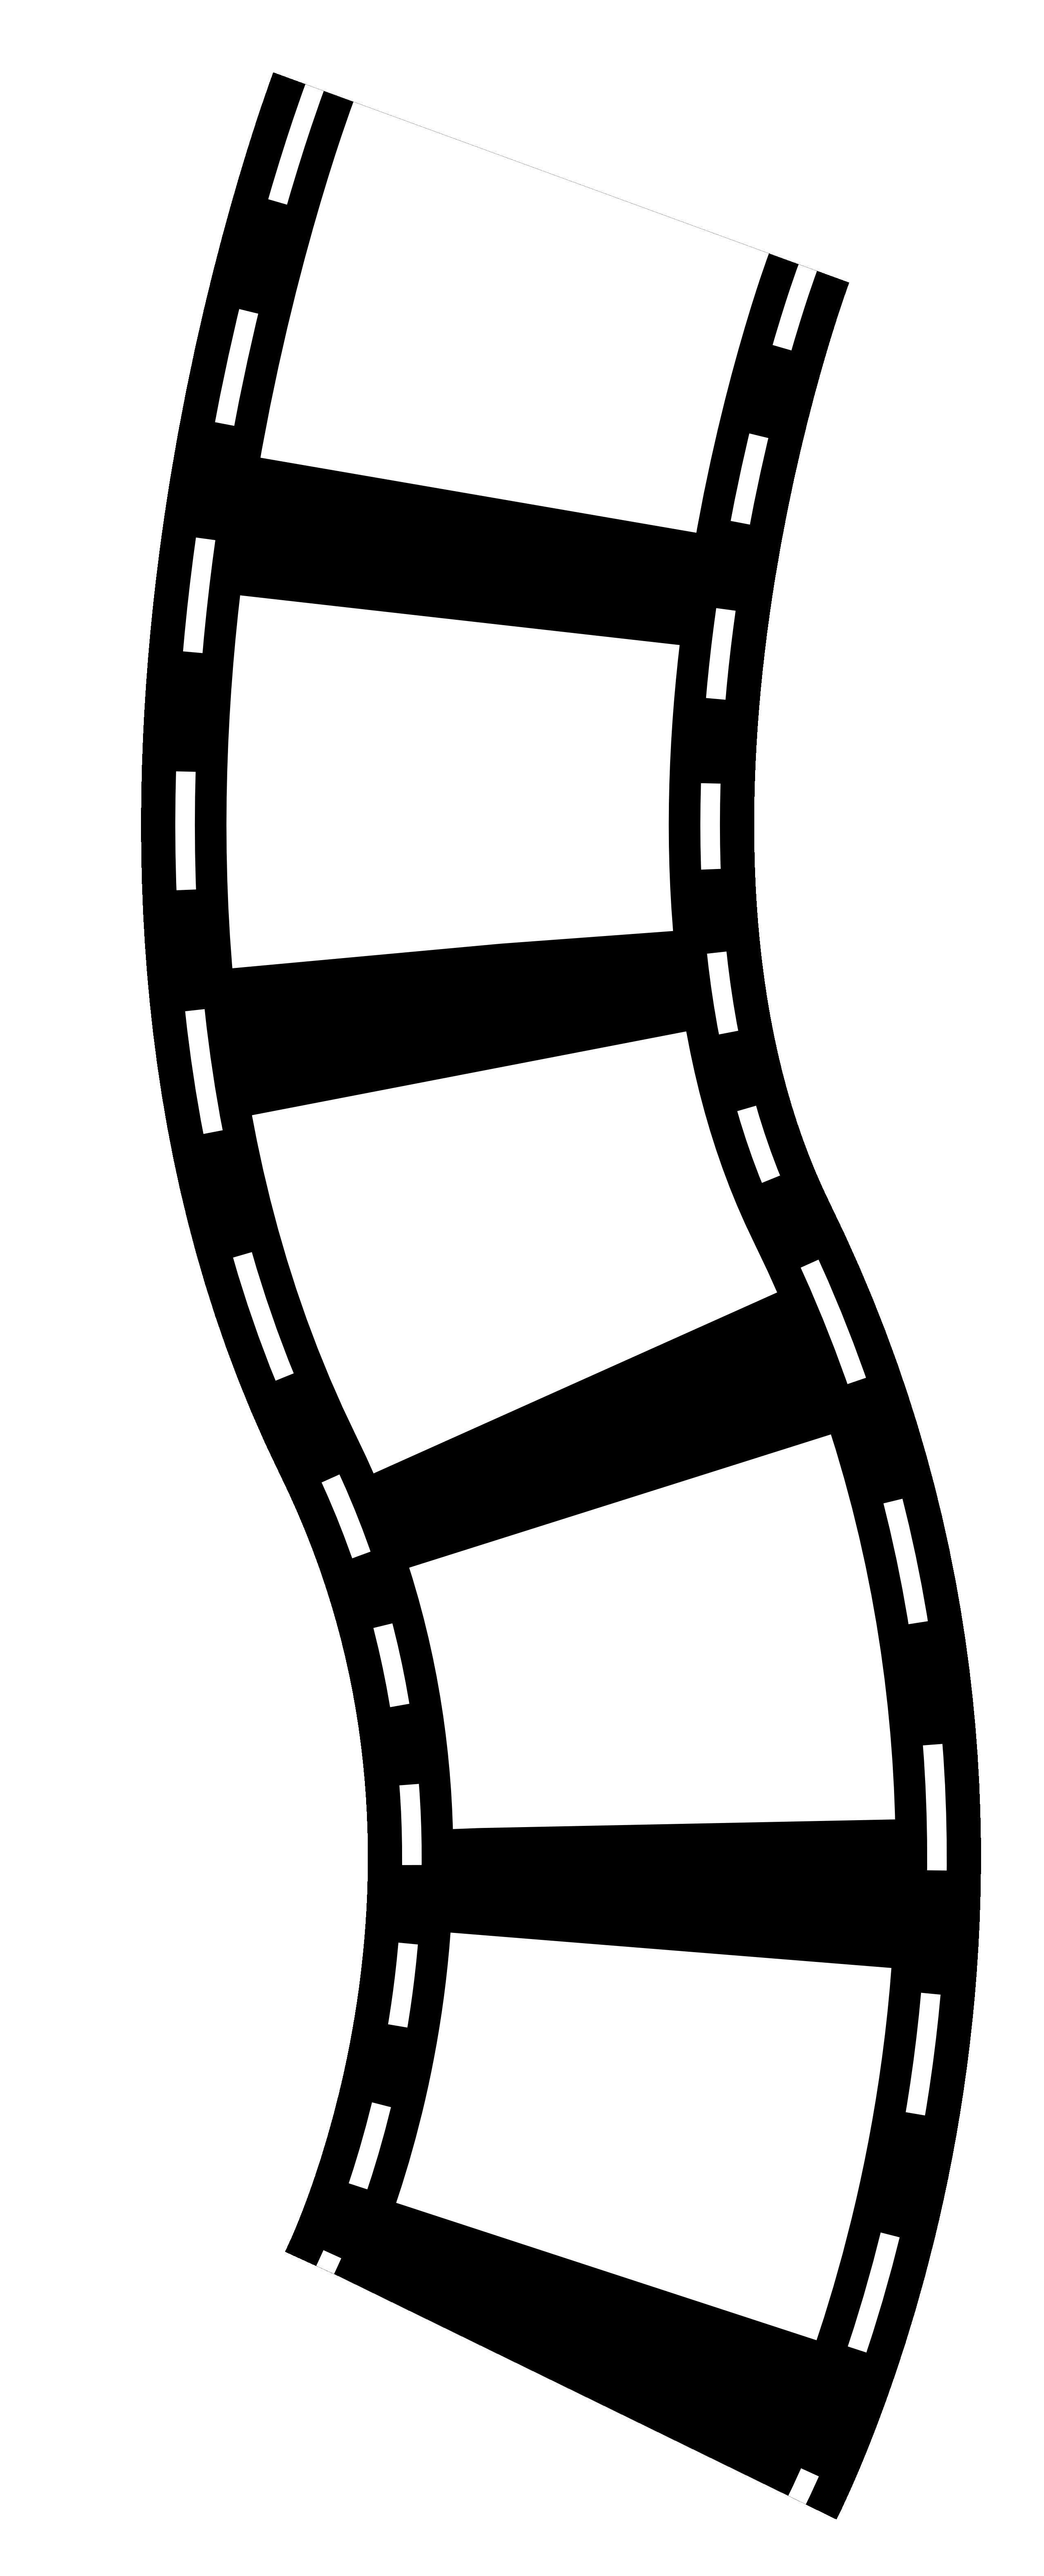 2555x6305 Movie Camera Film Roll Clip Art Clipart